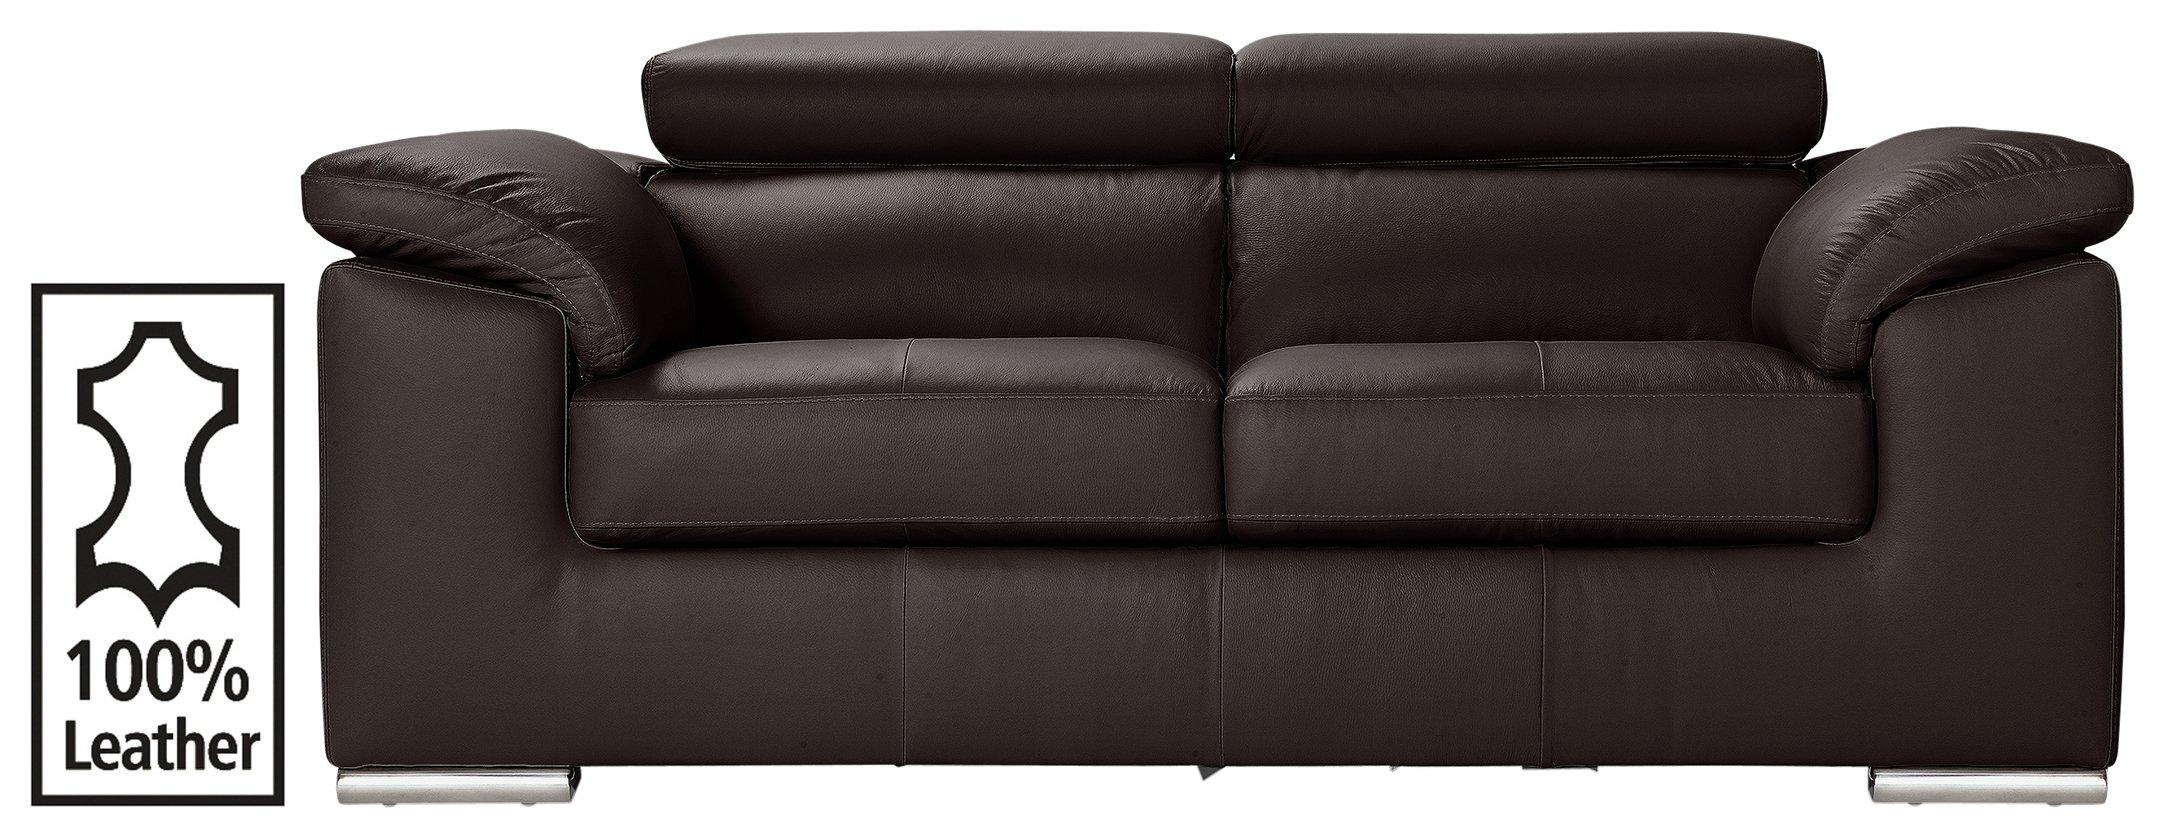 cheap sofas uk argos sofa bed etc farmingdale ny and chairs brokeasshome